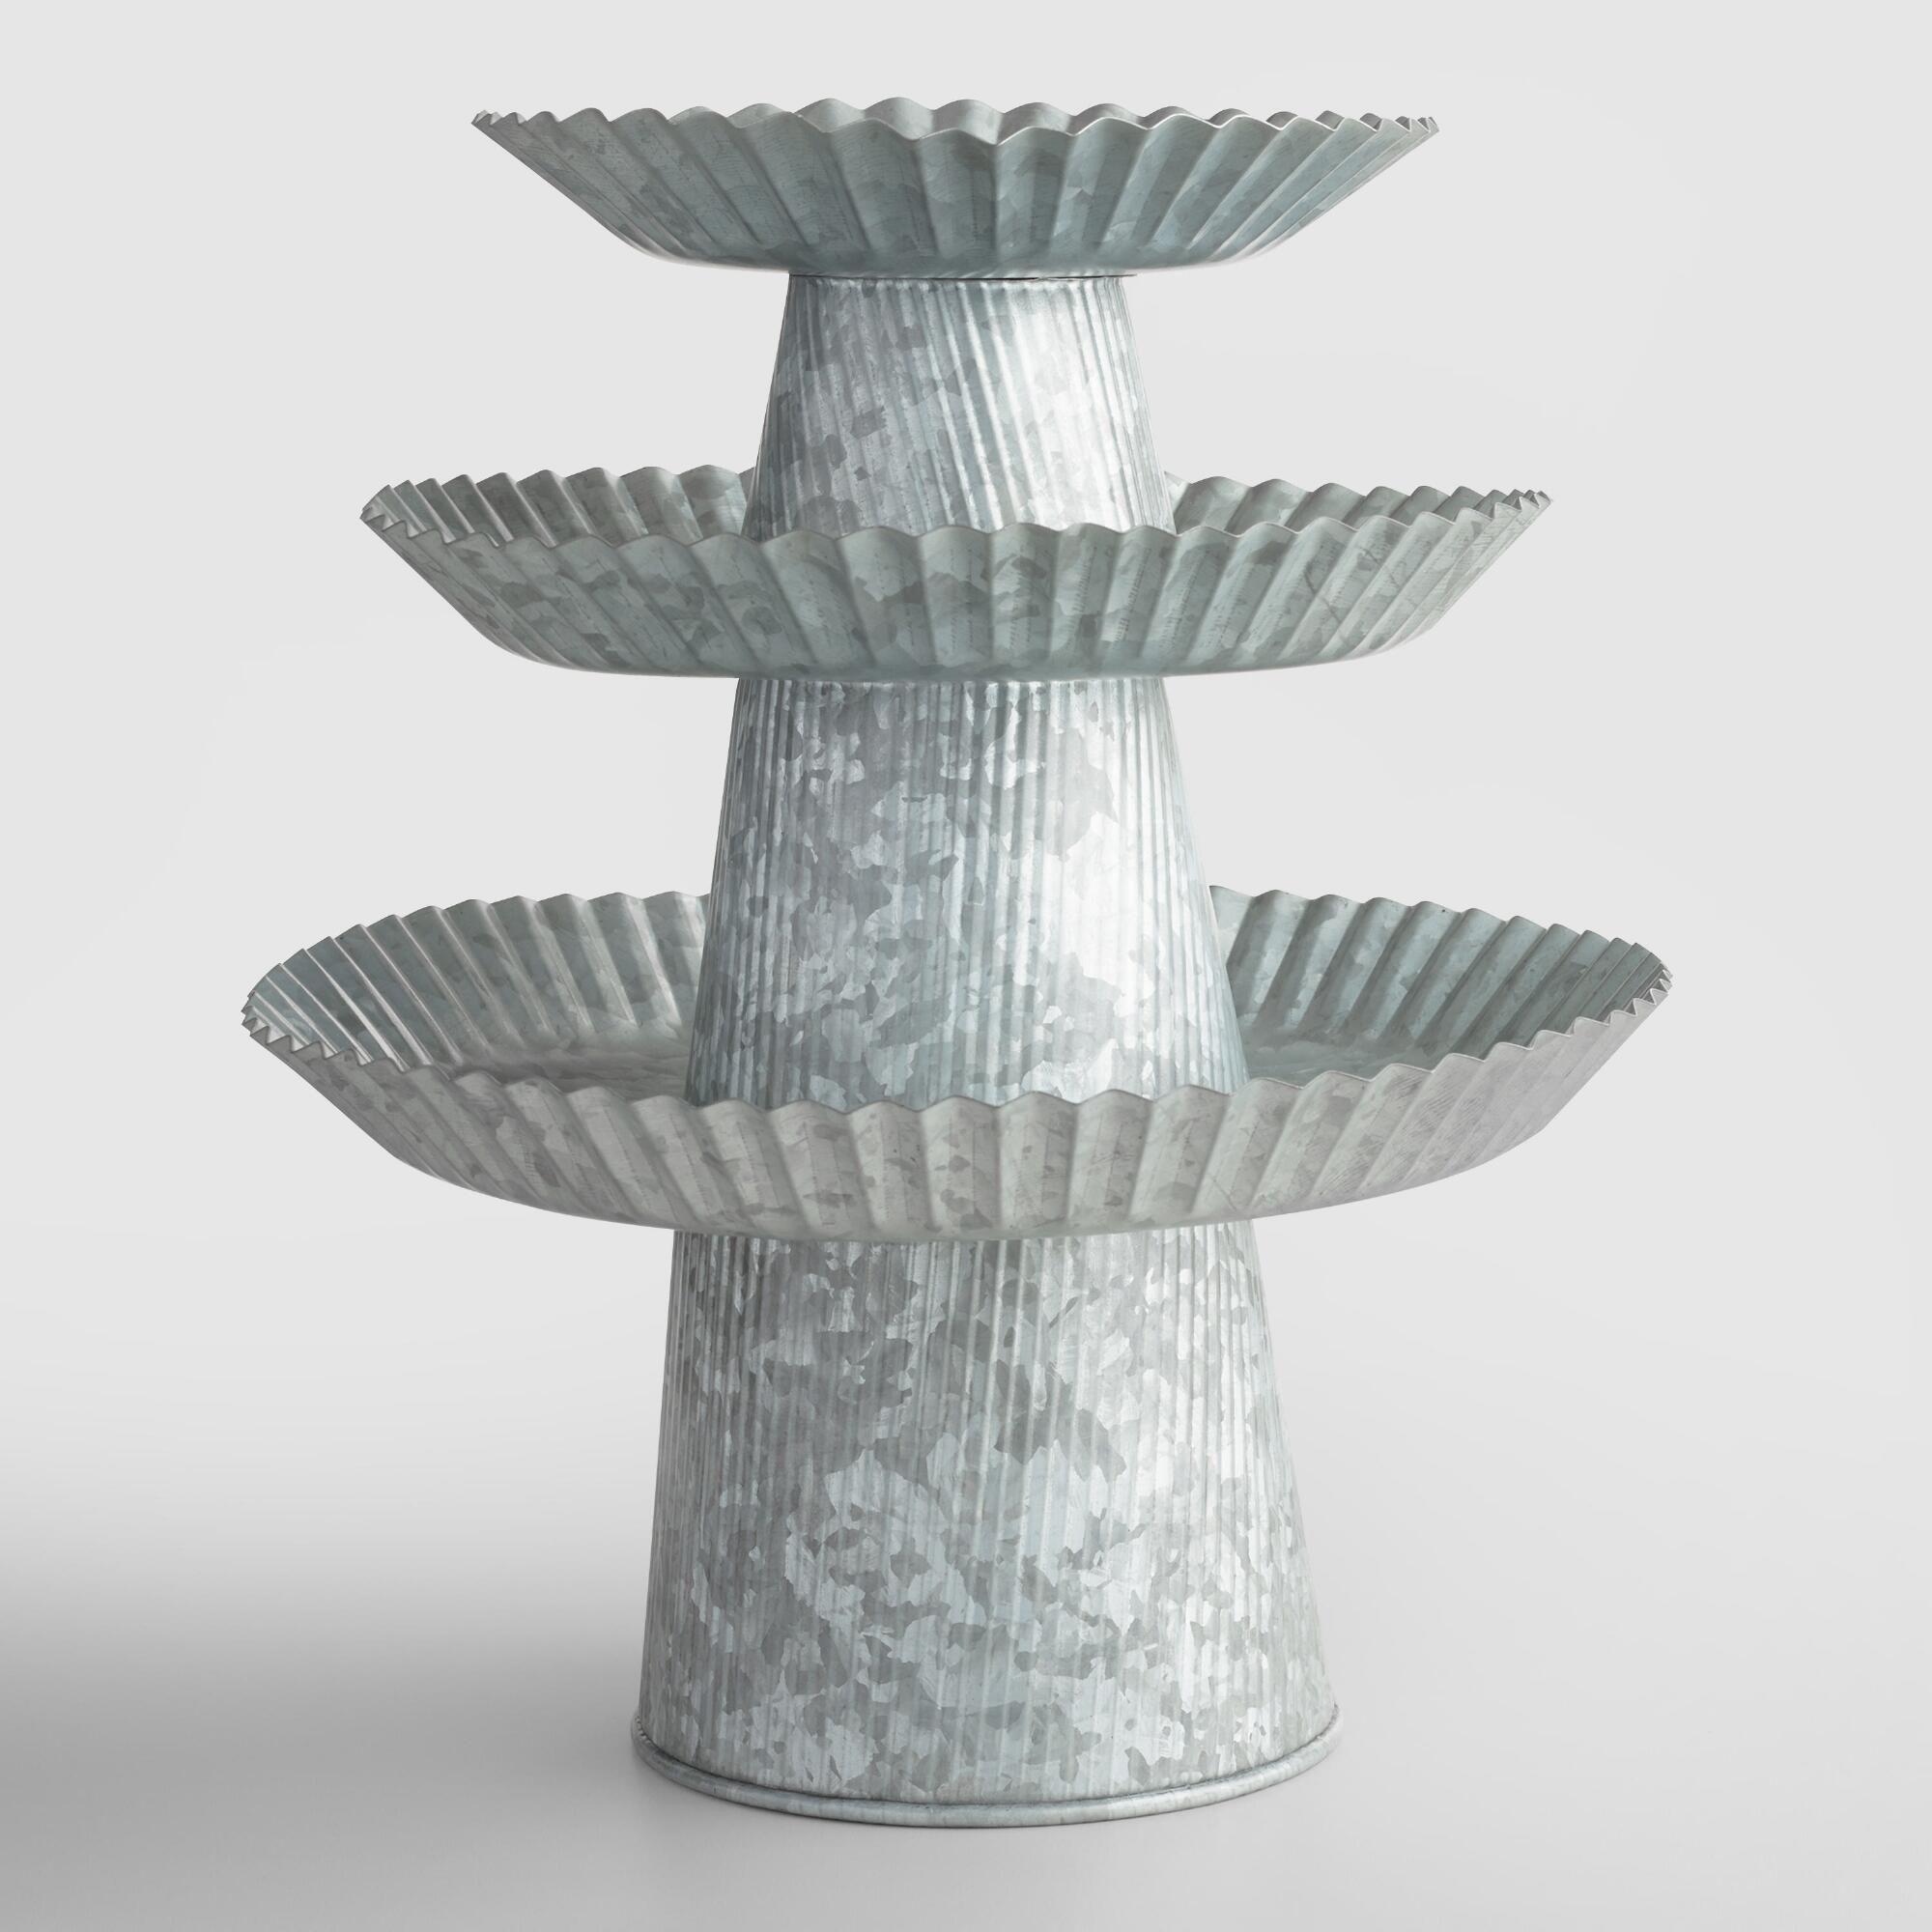 "Galvanized Cake Stand: Gray/Metallic - 8"" by World Market 8"""